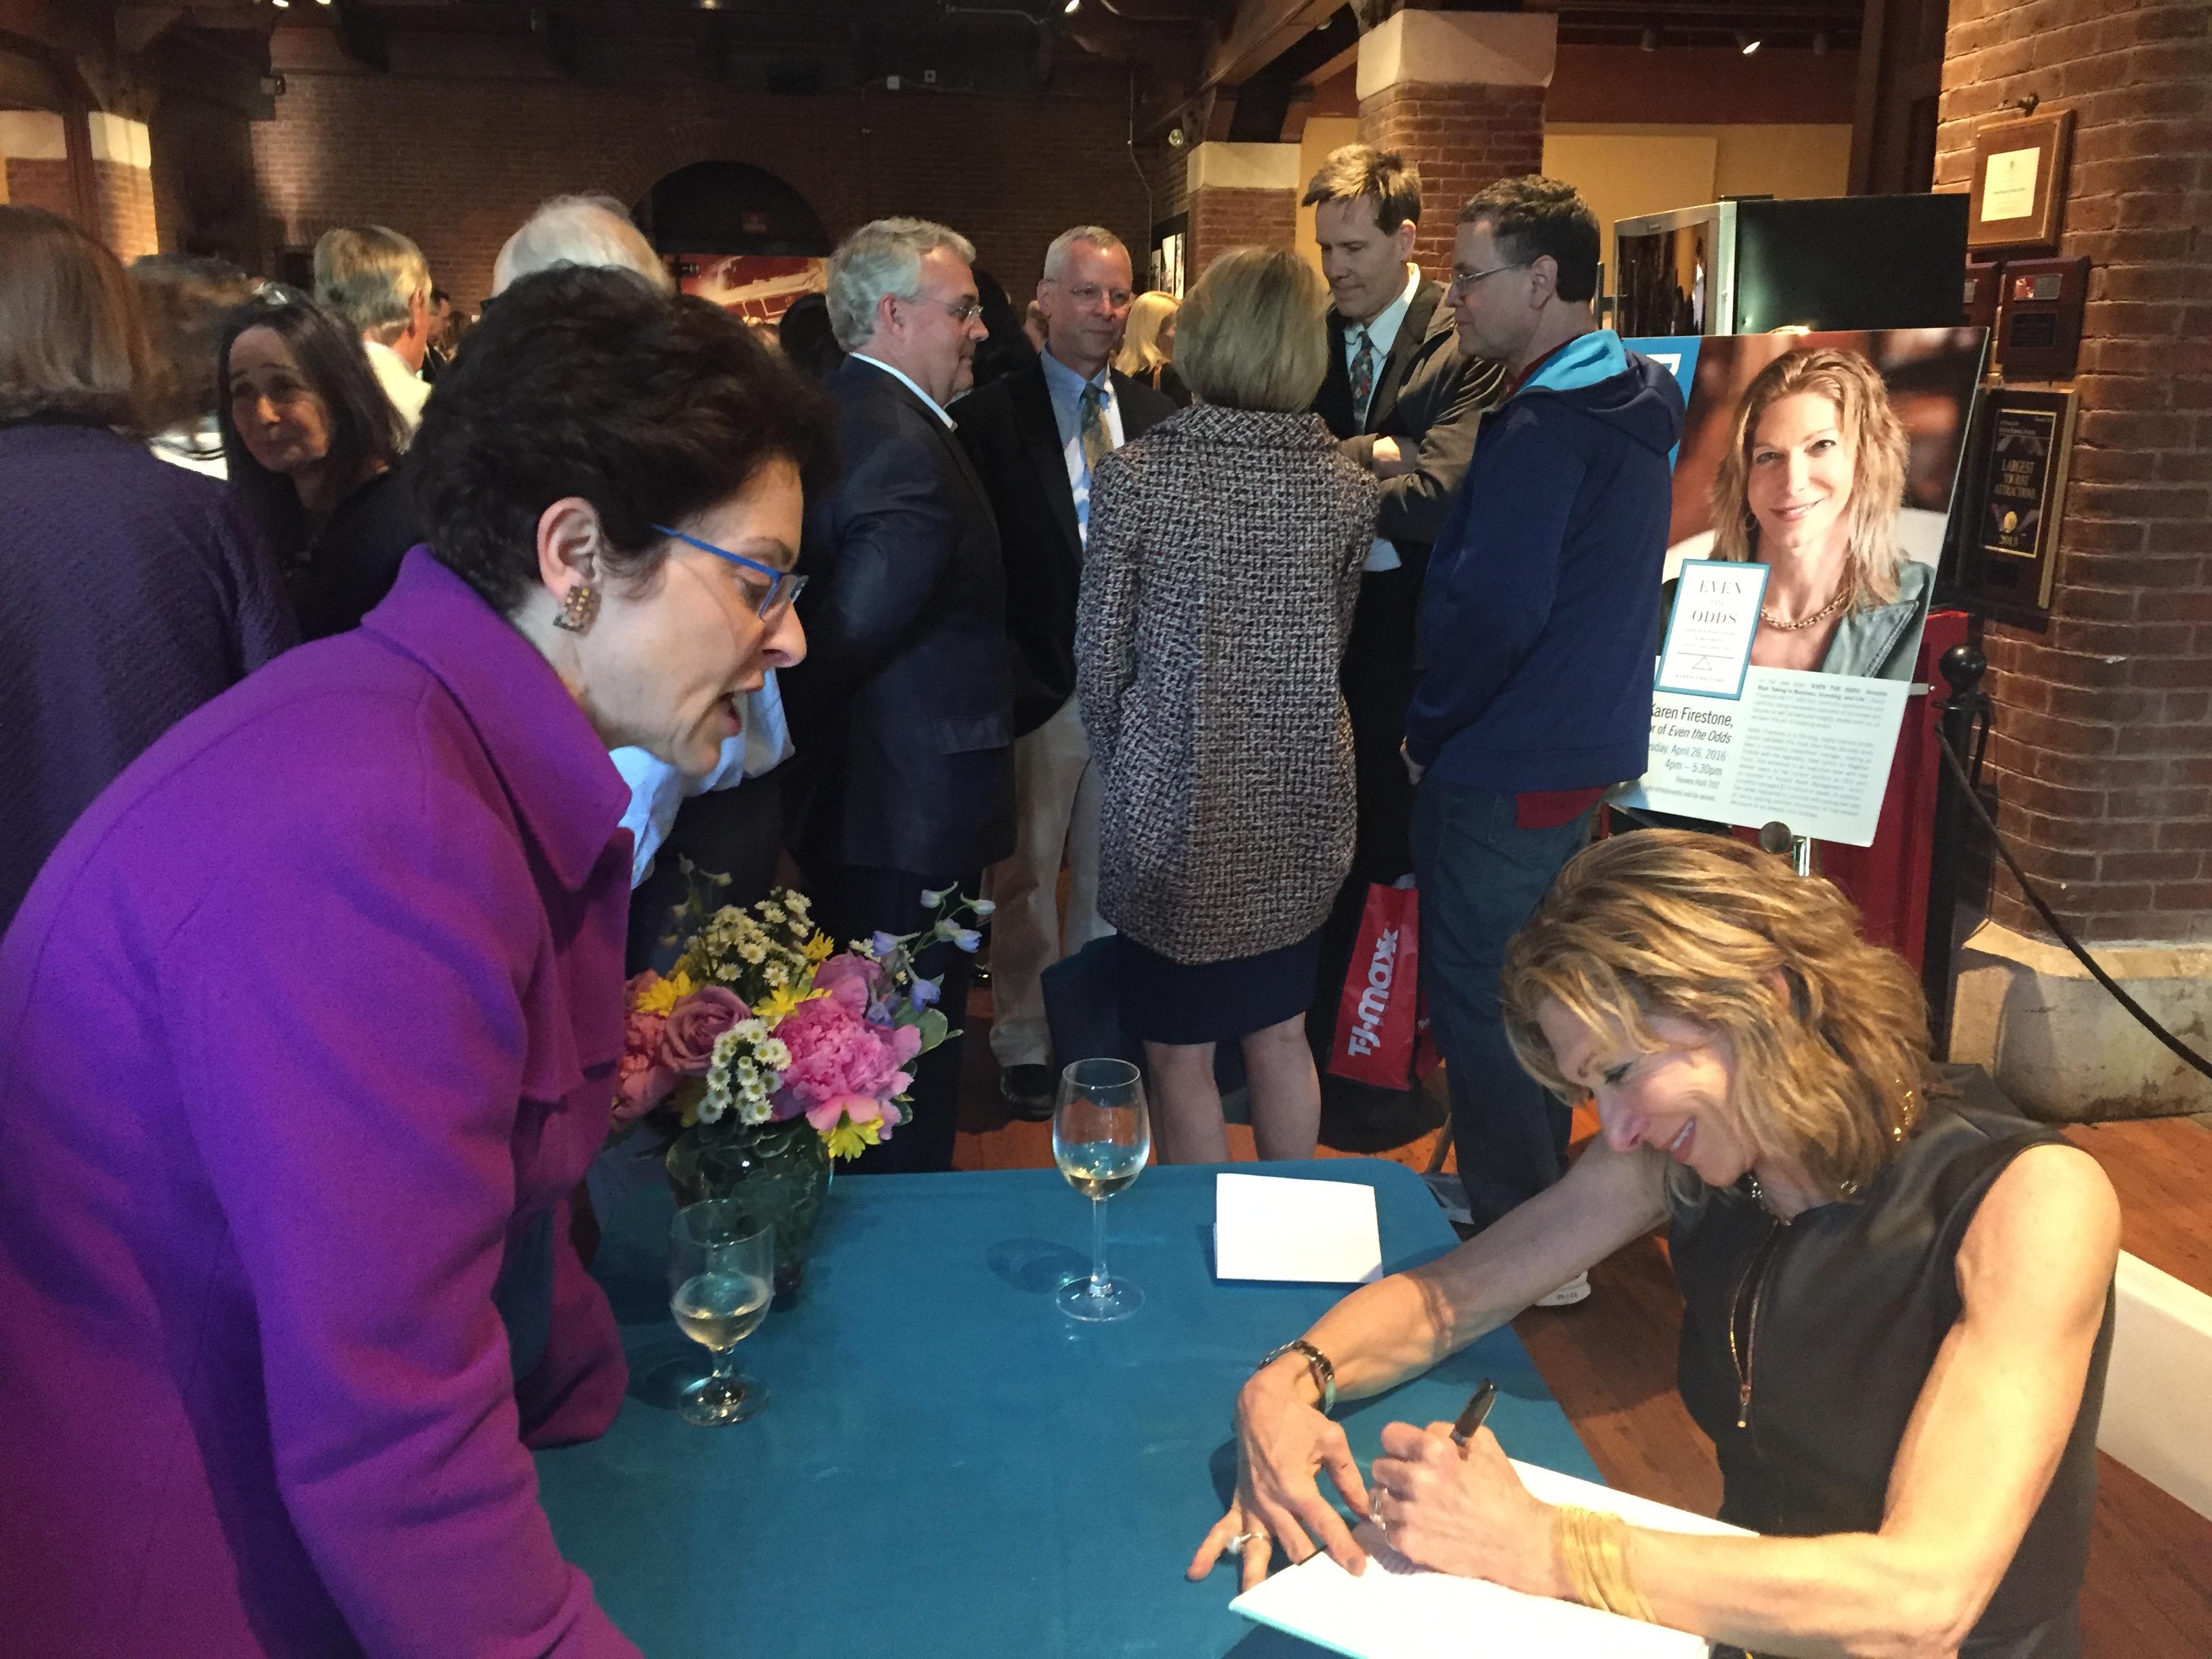 Karen Firestone Book Signing Event